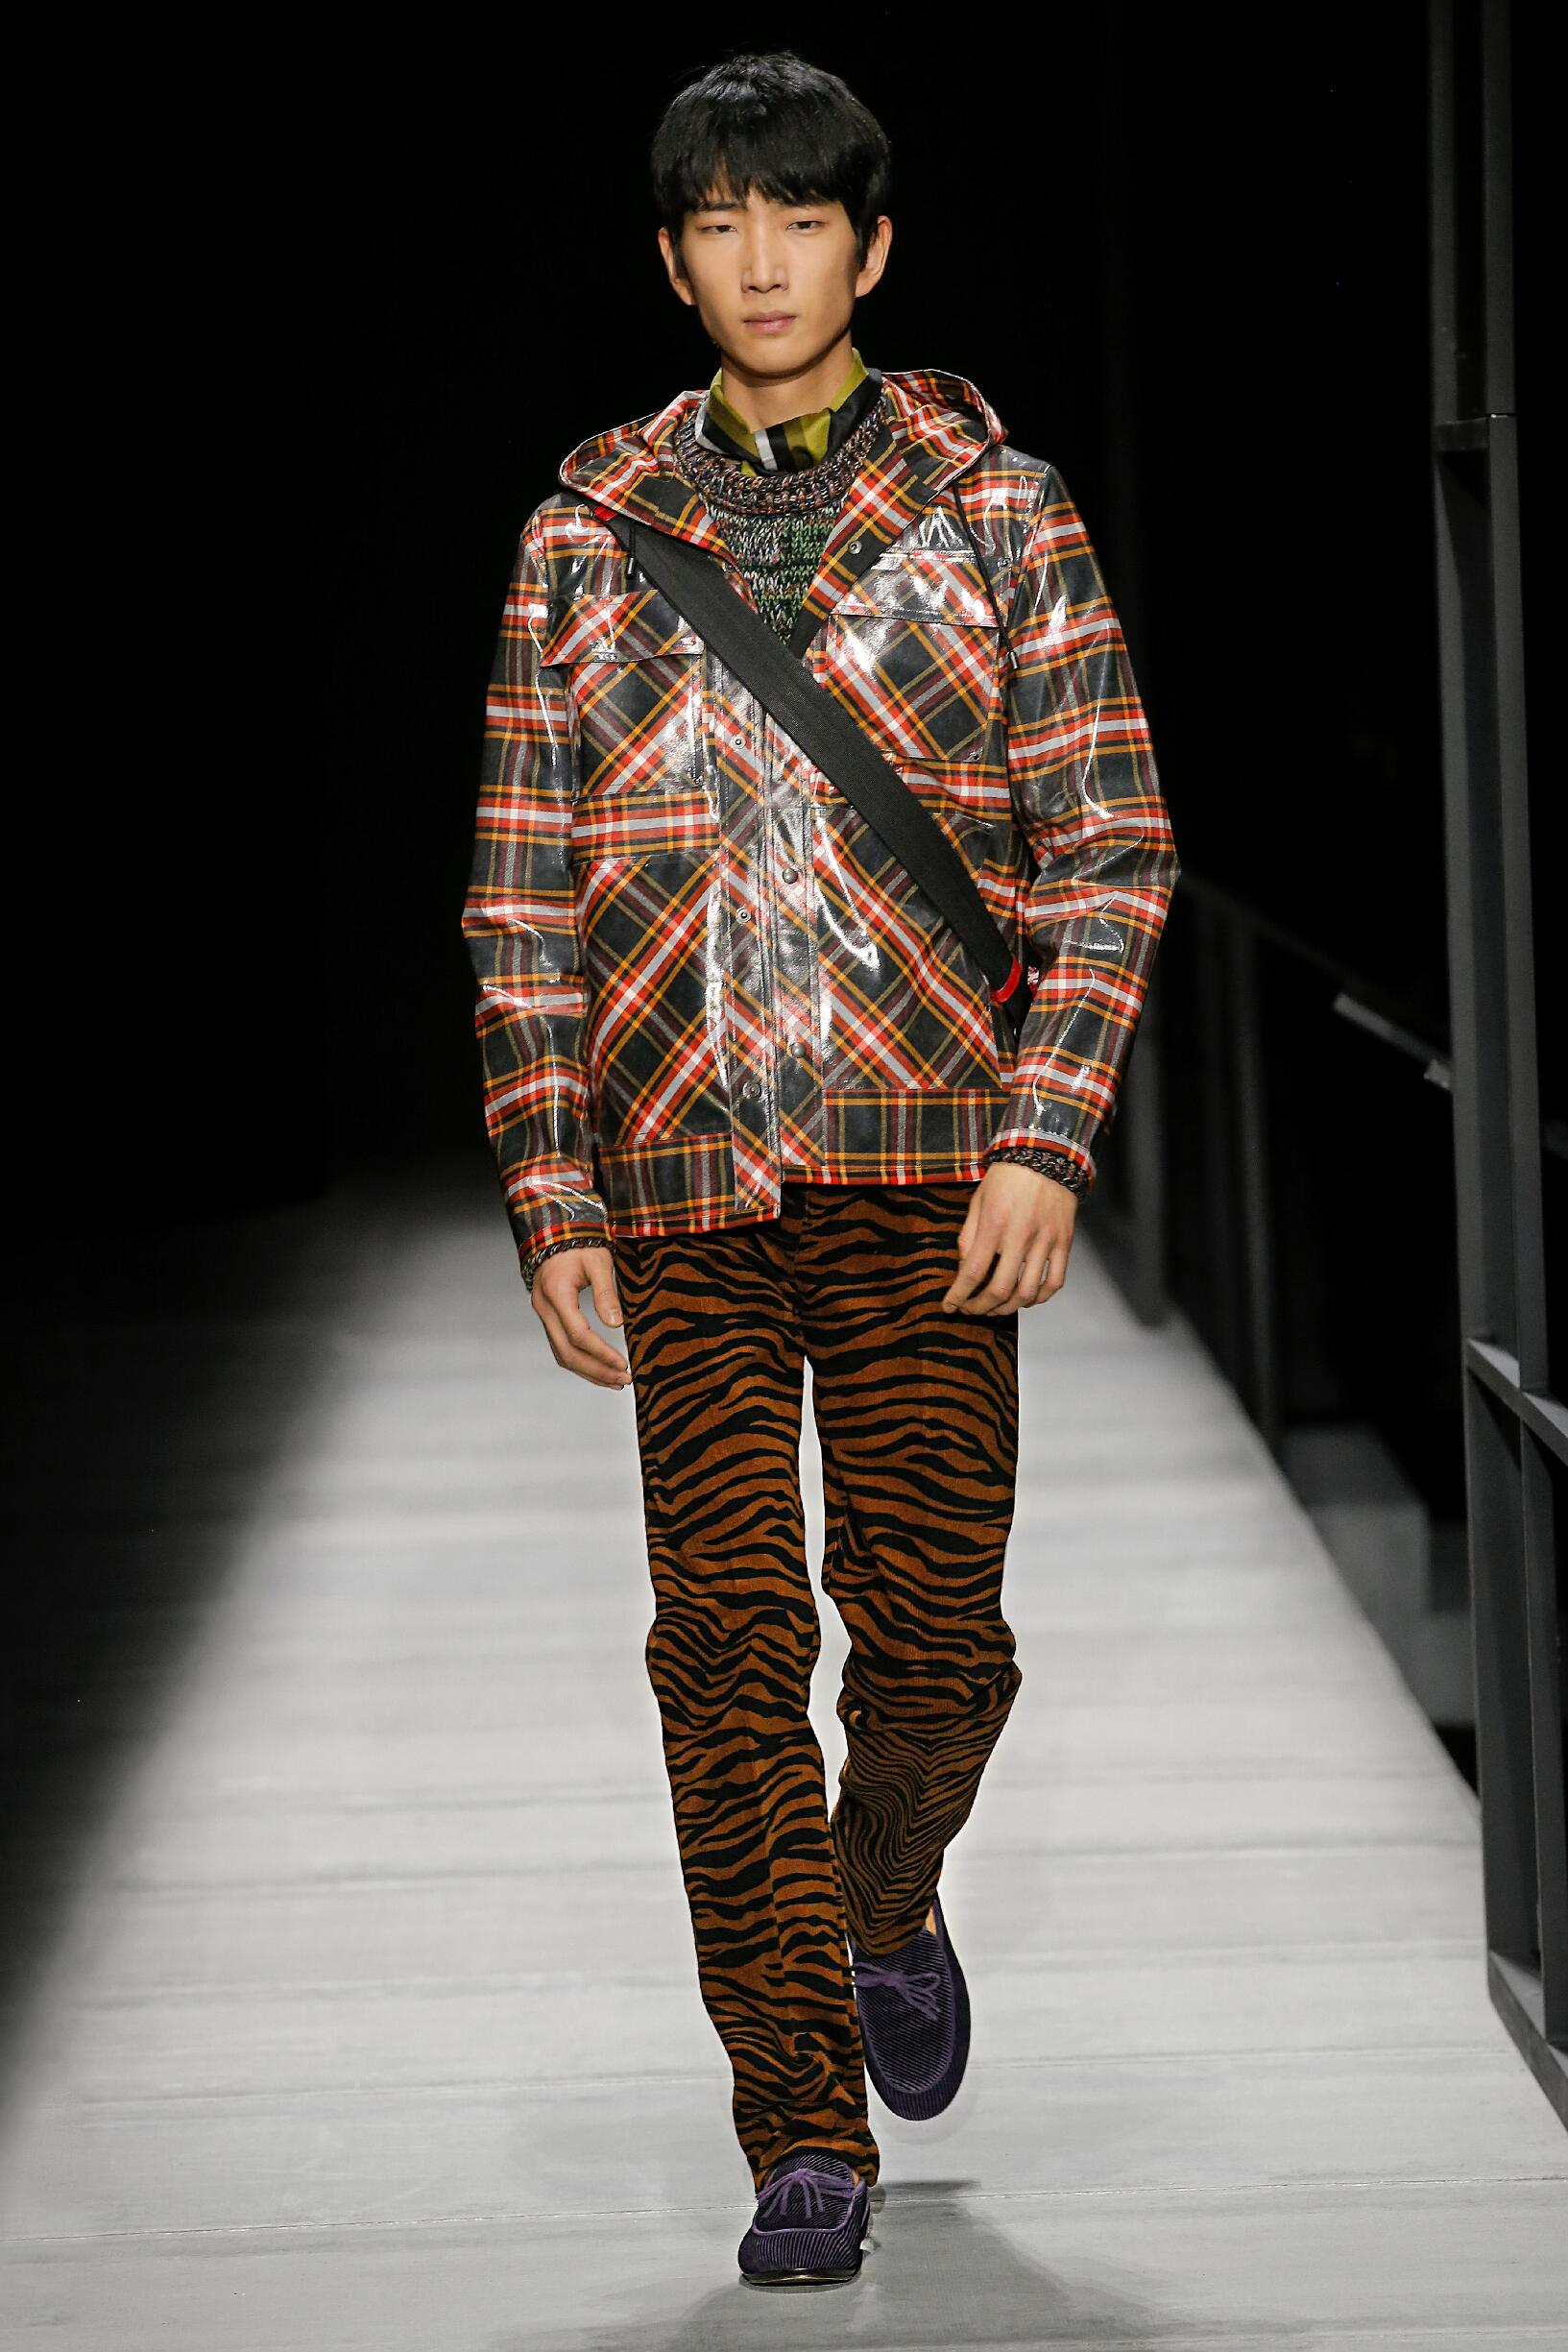 Fashion 2018-19 Man Trends Bottega Veneta